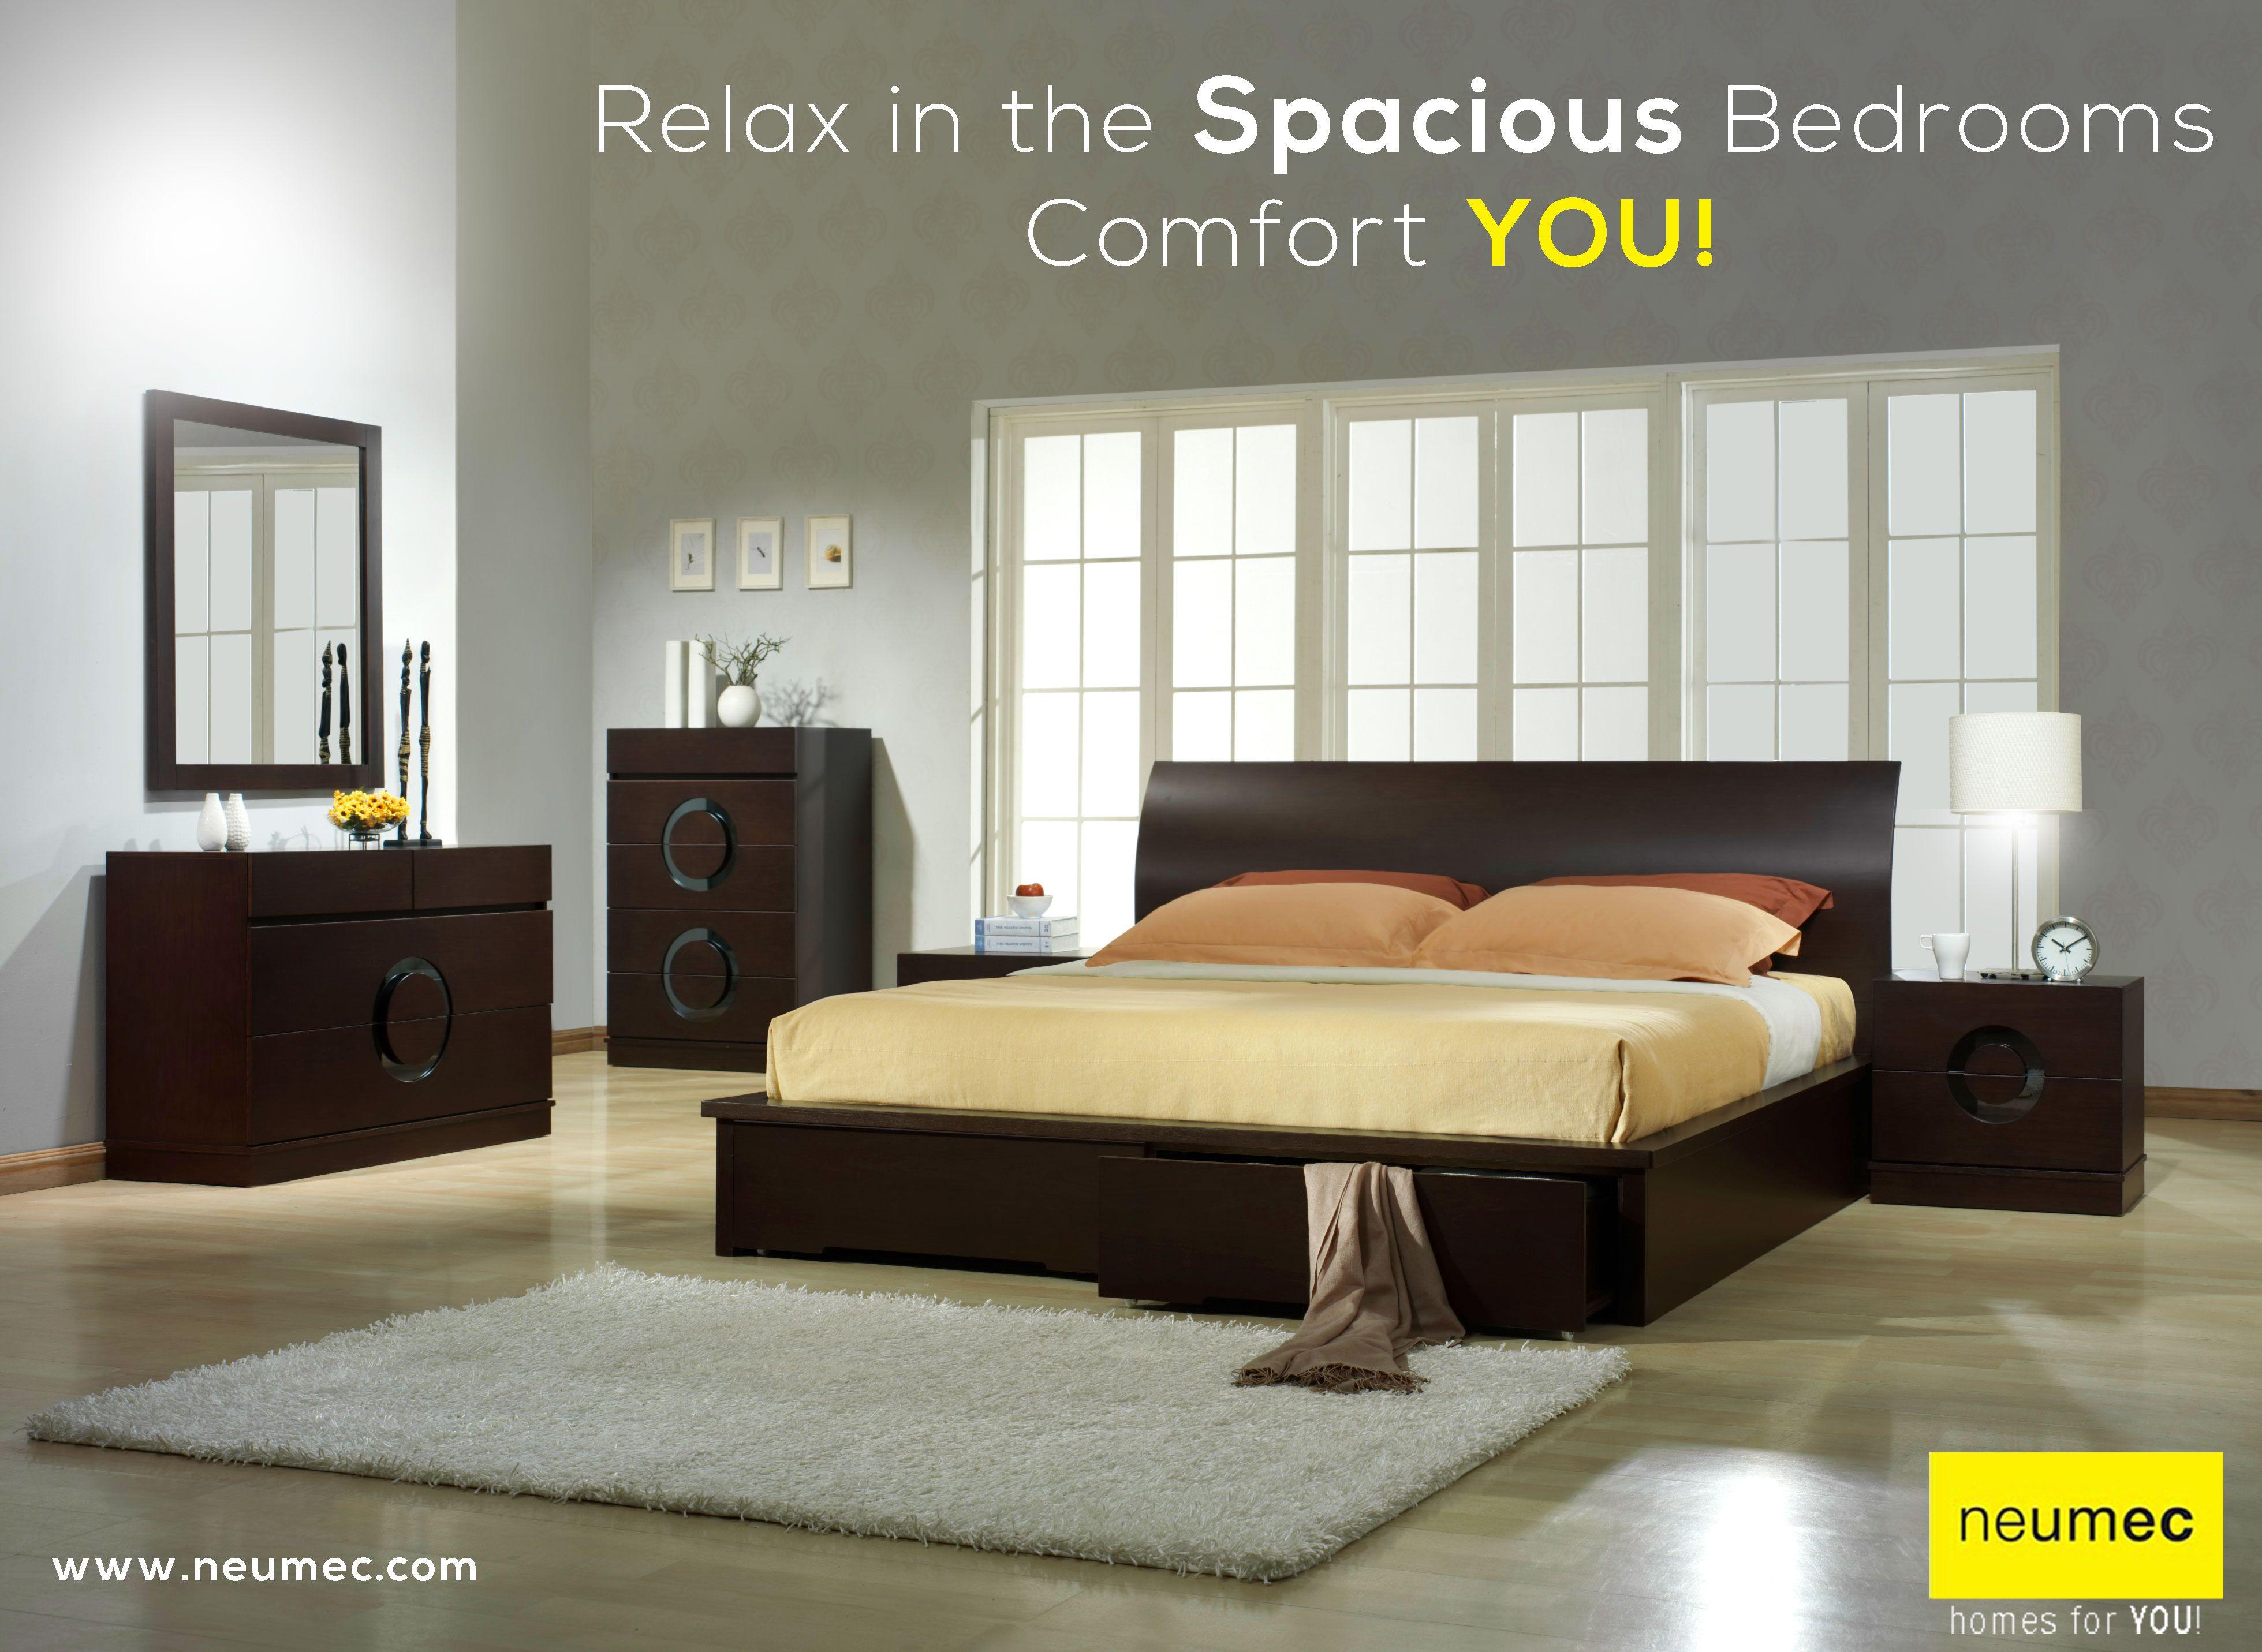 Neumec Group - Beyond the sale #YOULive #Neumec #realestate #homes  www.neumec.com